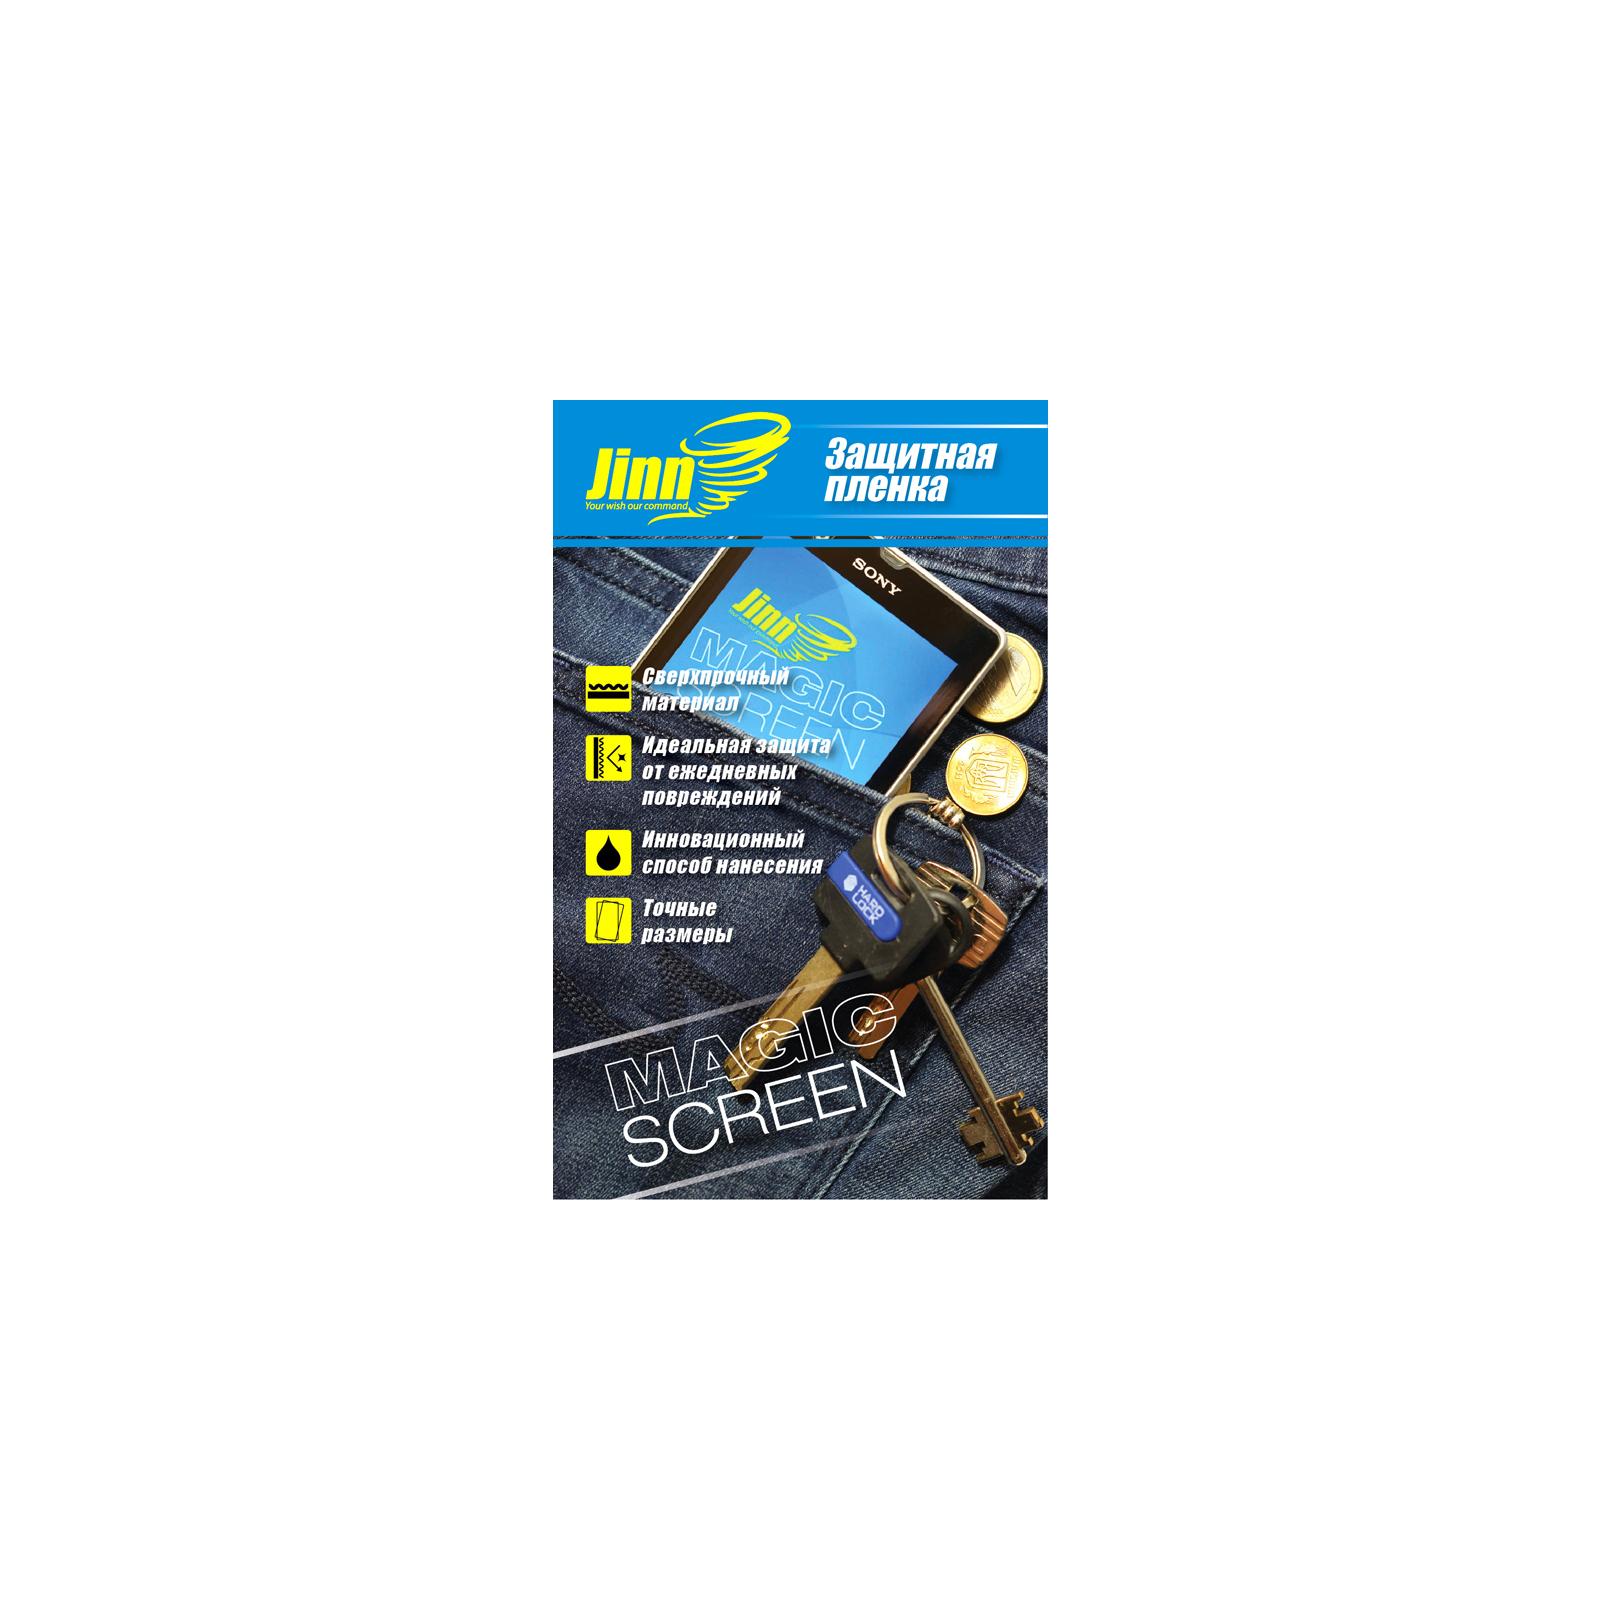 Пленка защитная JINN надміцна Magic Screen для Samsung Galaxy Ace 3 / iii s7272 ( (Samsung Galaxy Ace 3 front)